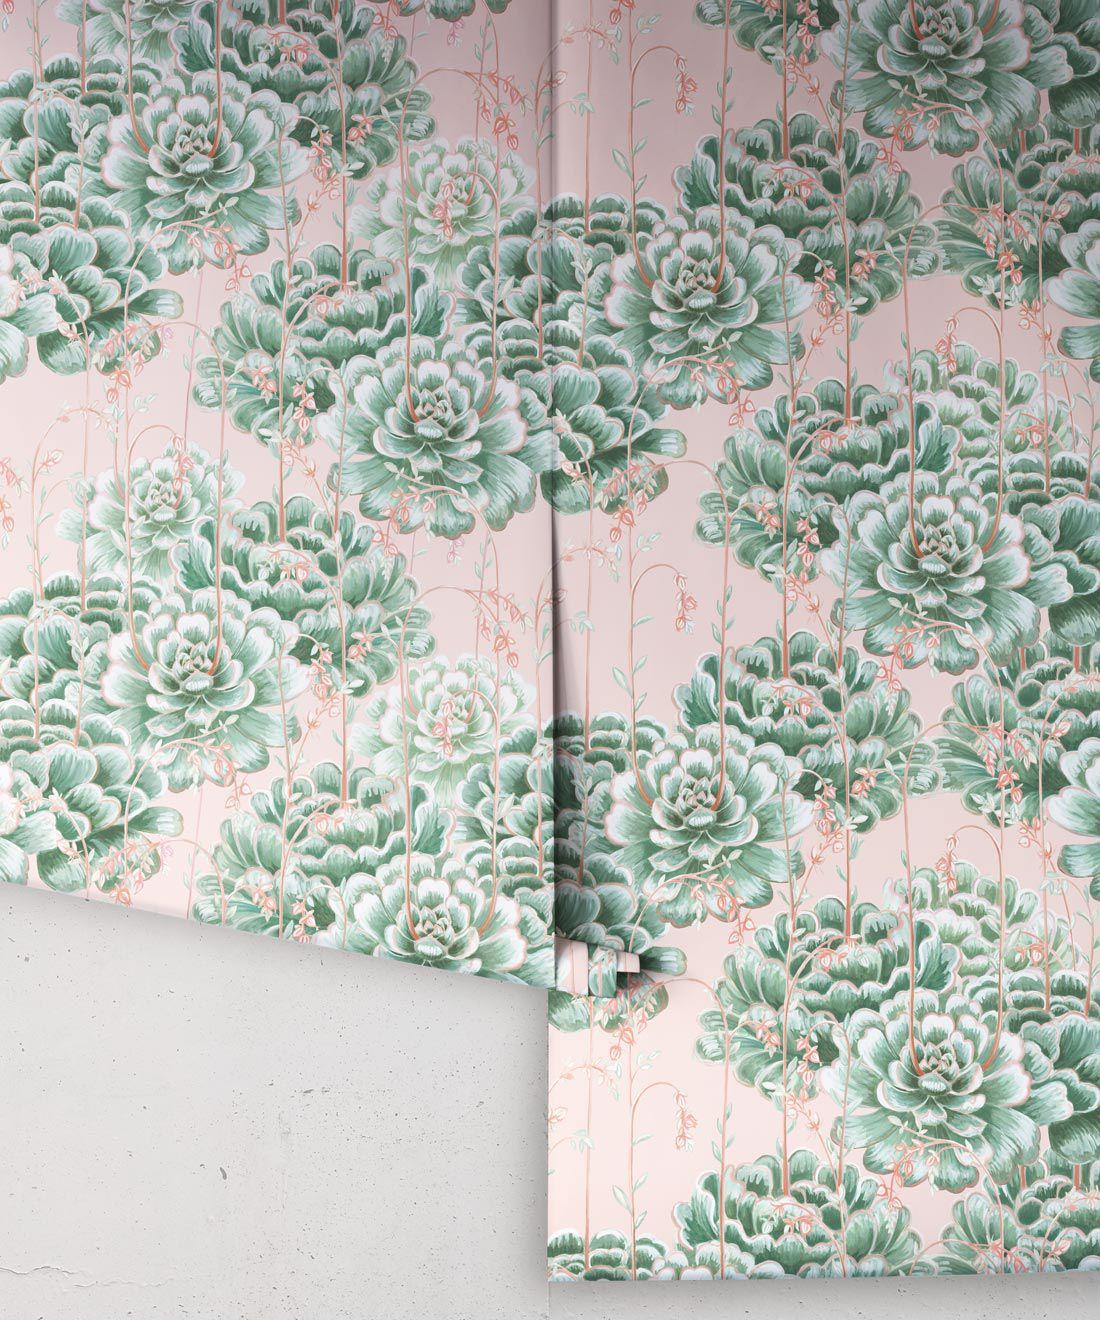 Succulents Wallpaper Green Pink • Cactus Wallpaper • Desert Wallpaper rolls on pink background